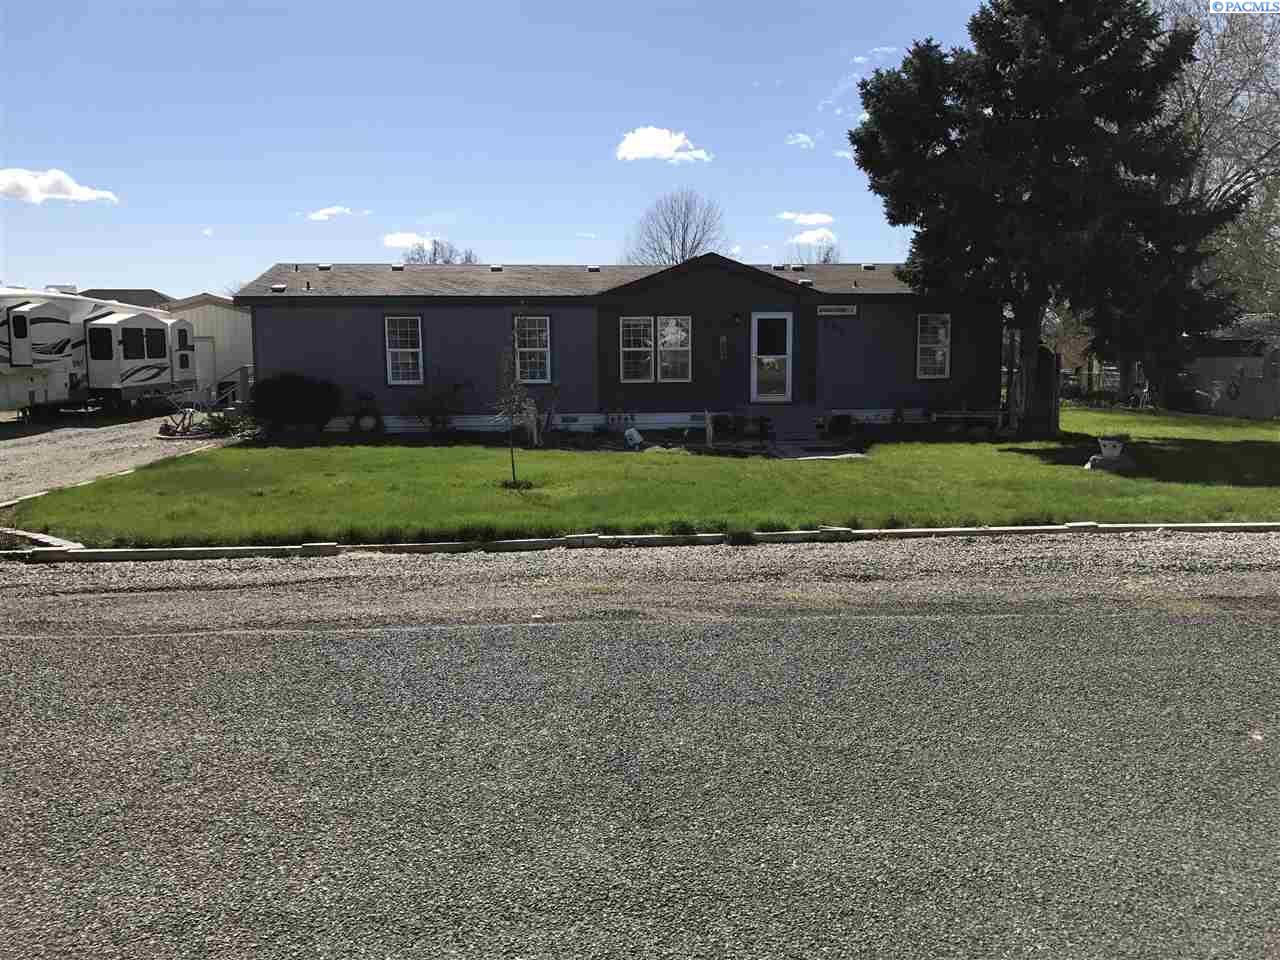 196 Largent Rd, Burbank, WA 99323